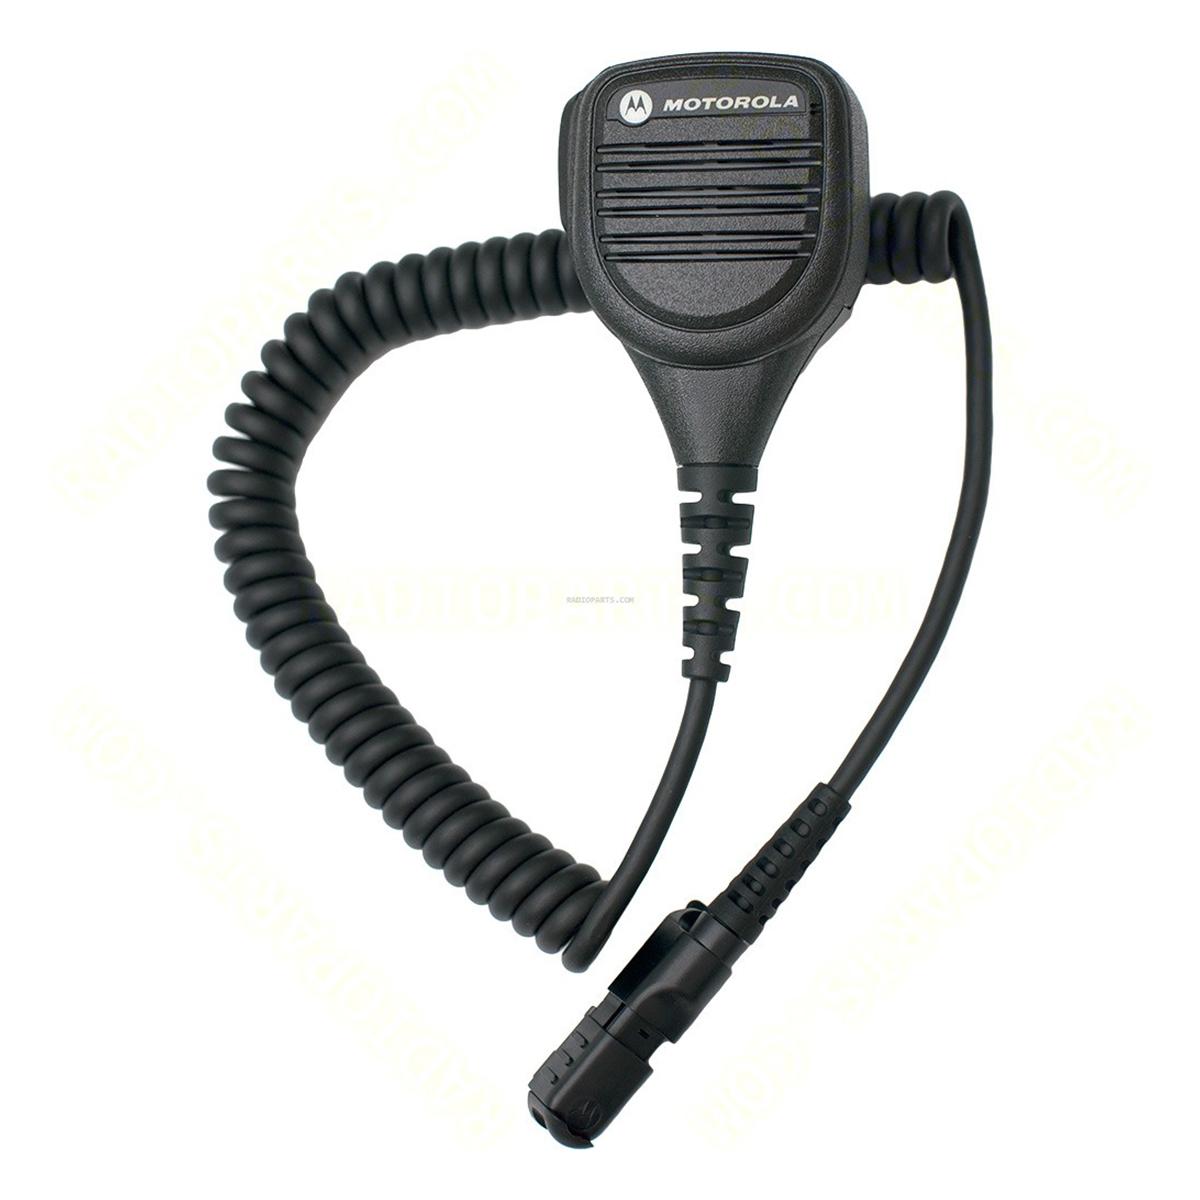 Micrófono Motorola parlante de solapa PMMN4075